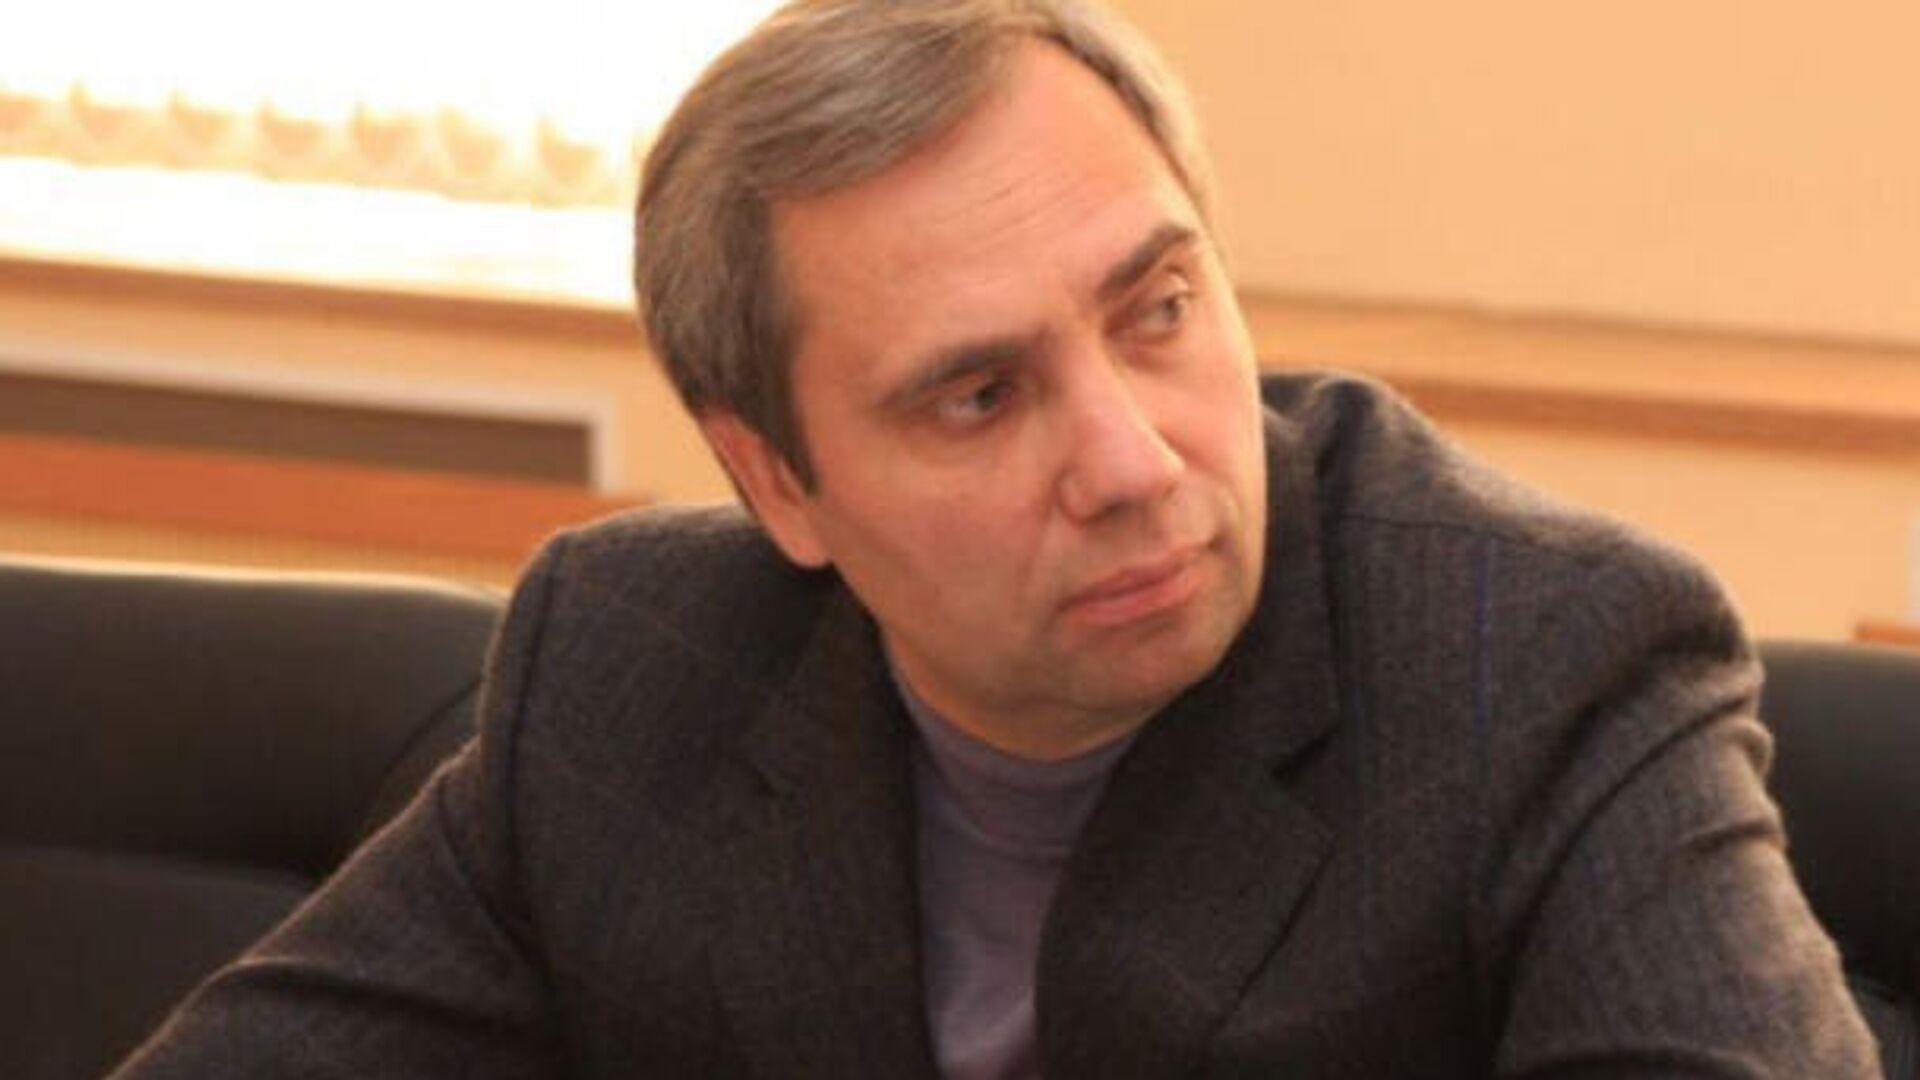 Перед убийством депутата Петрова из его дома похитили сейф